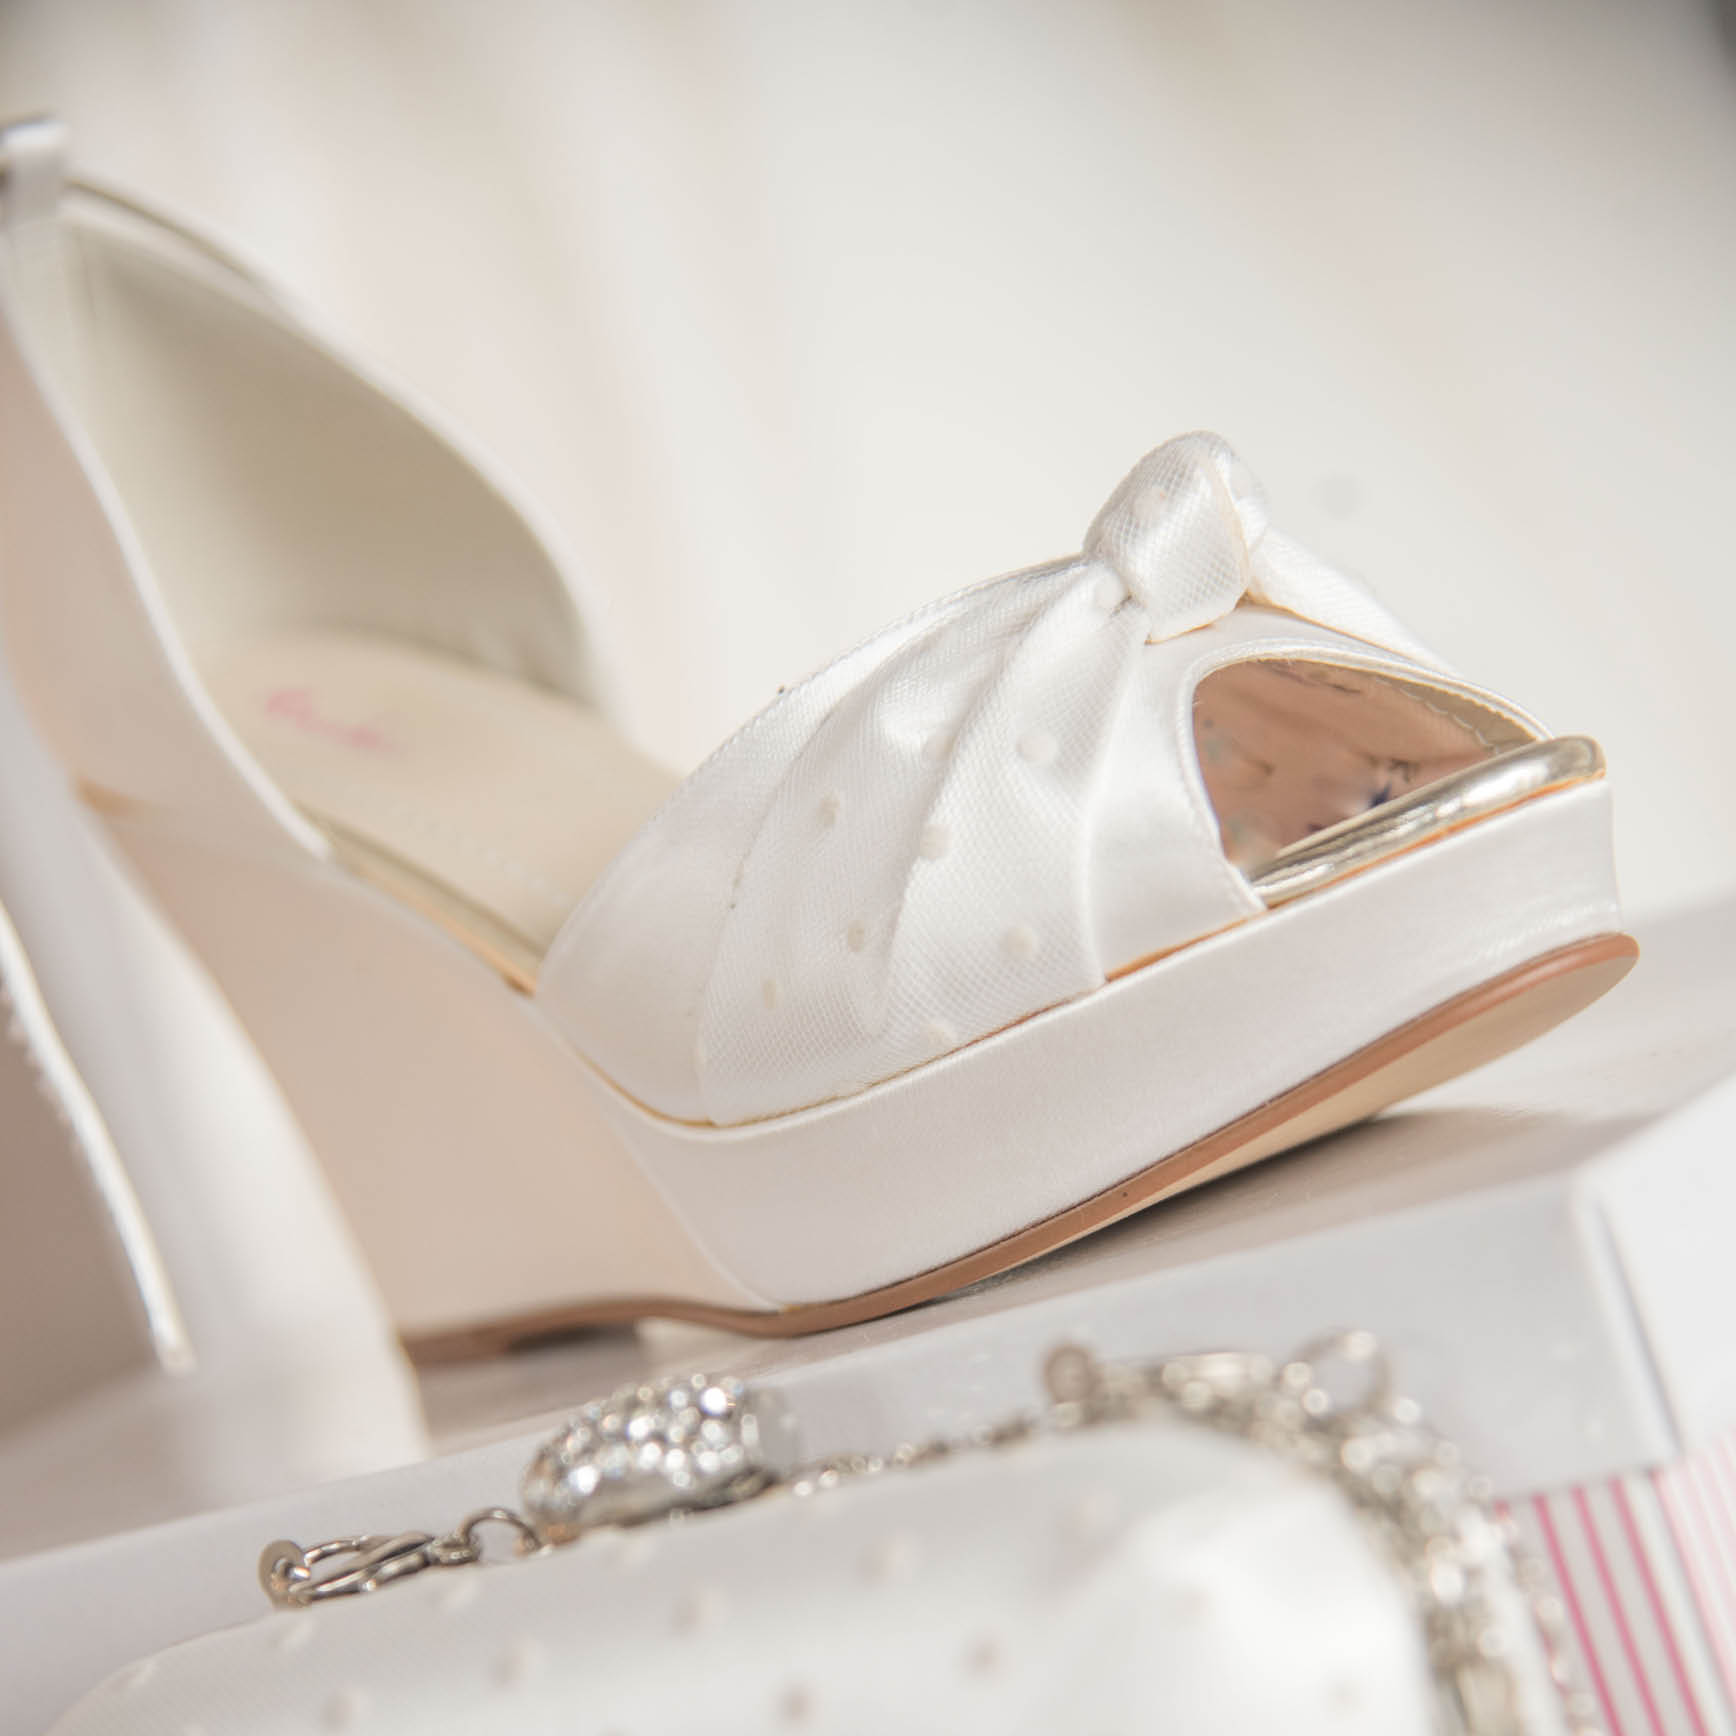 Brautmodengeschäft